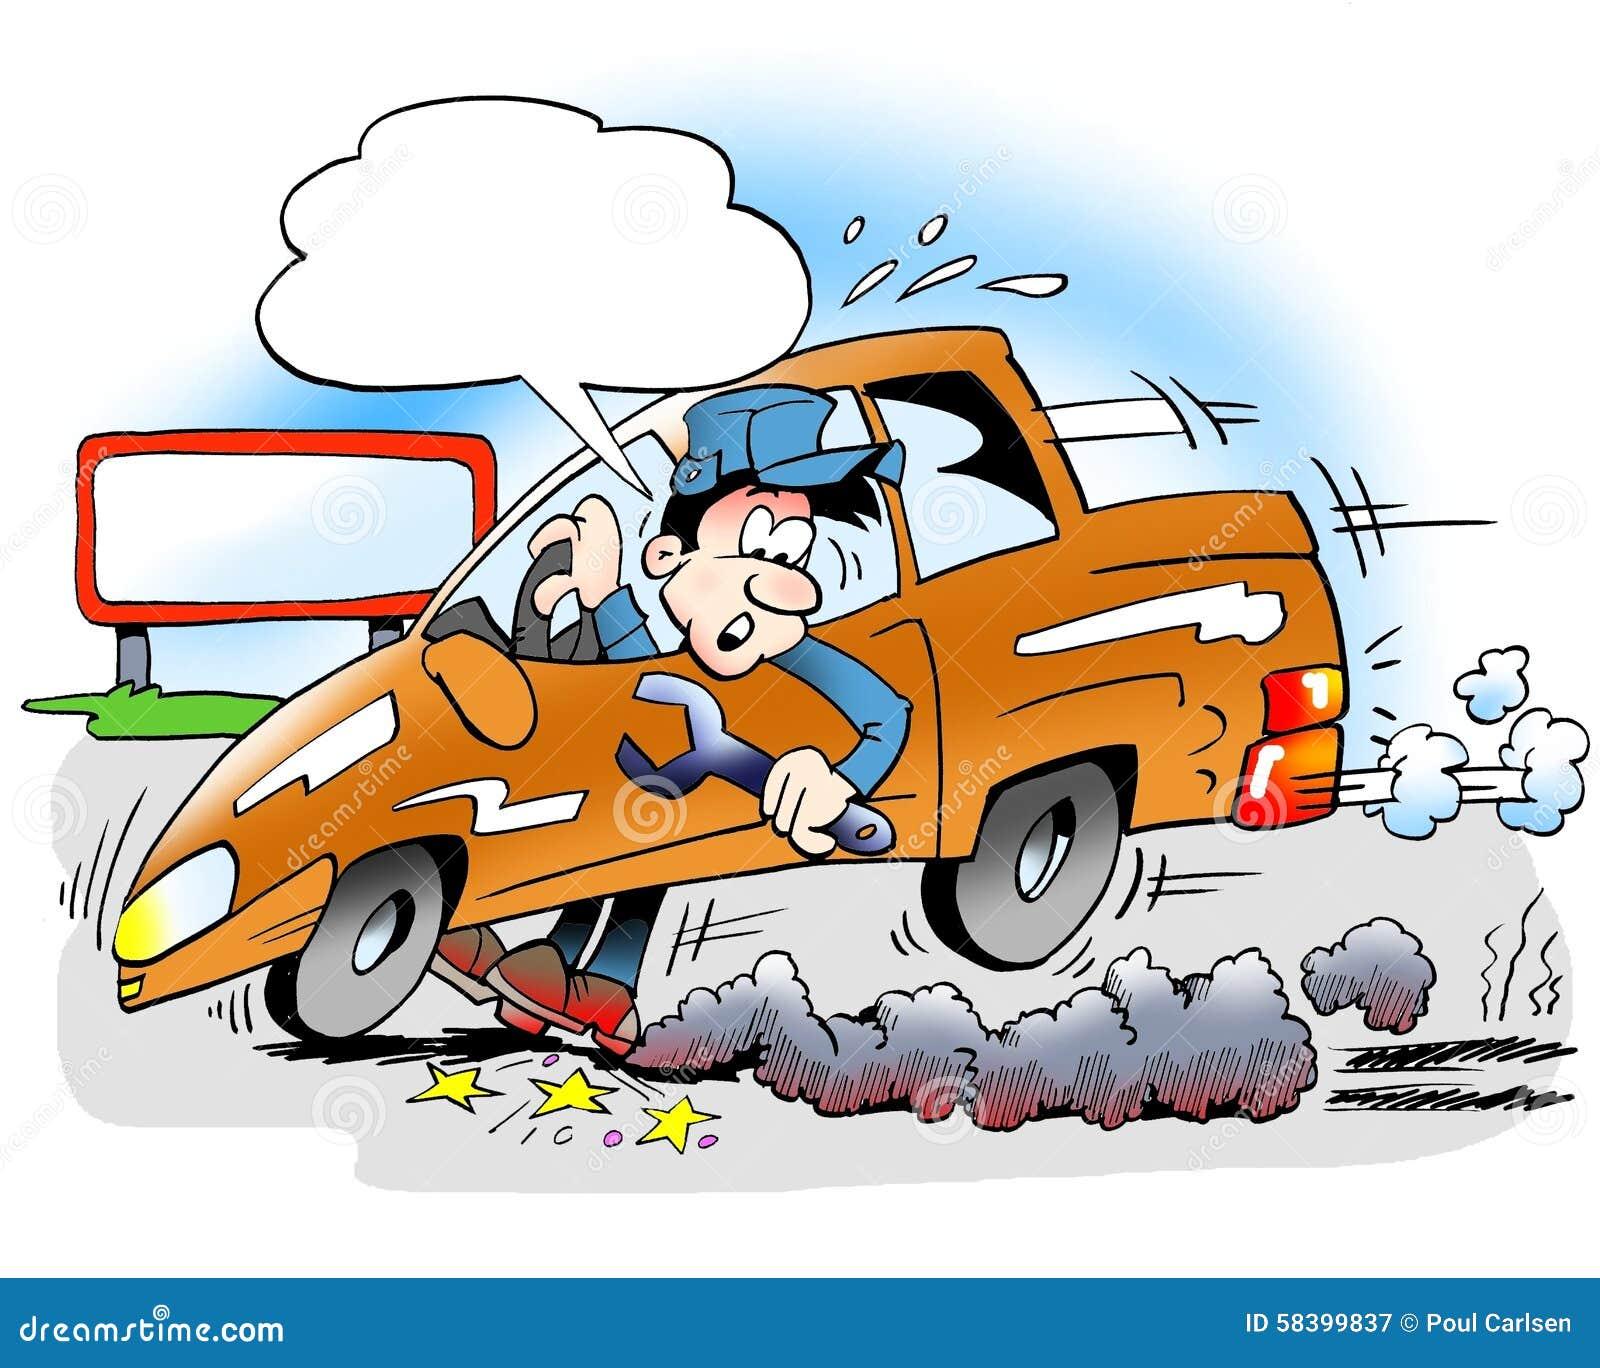 Car Brake Test : Brake test stock illustration image